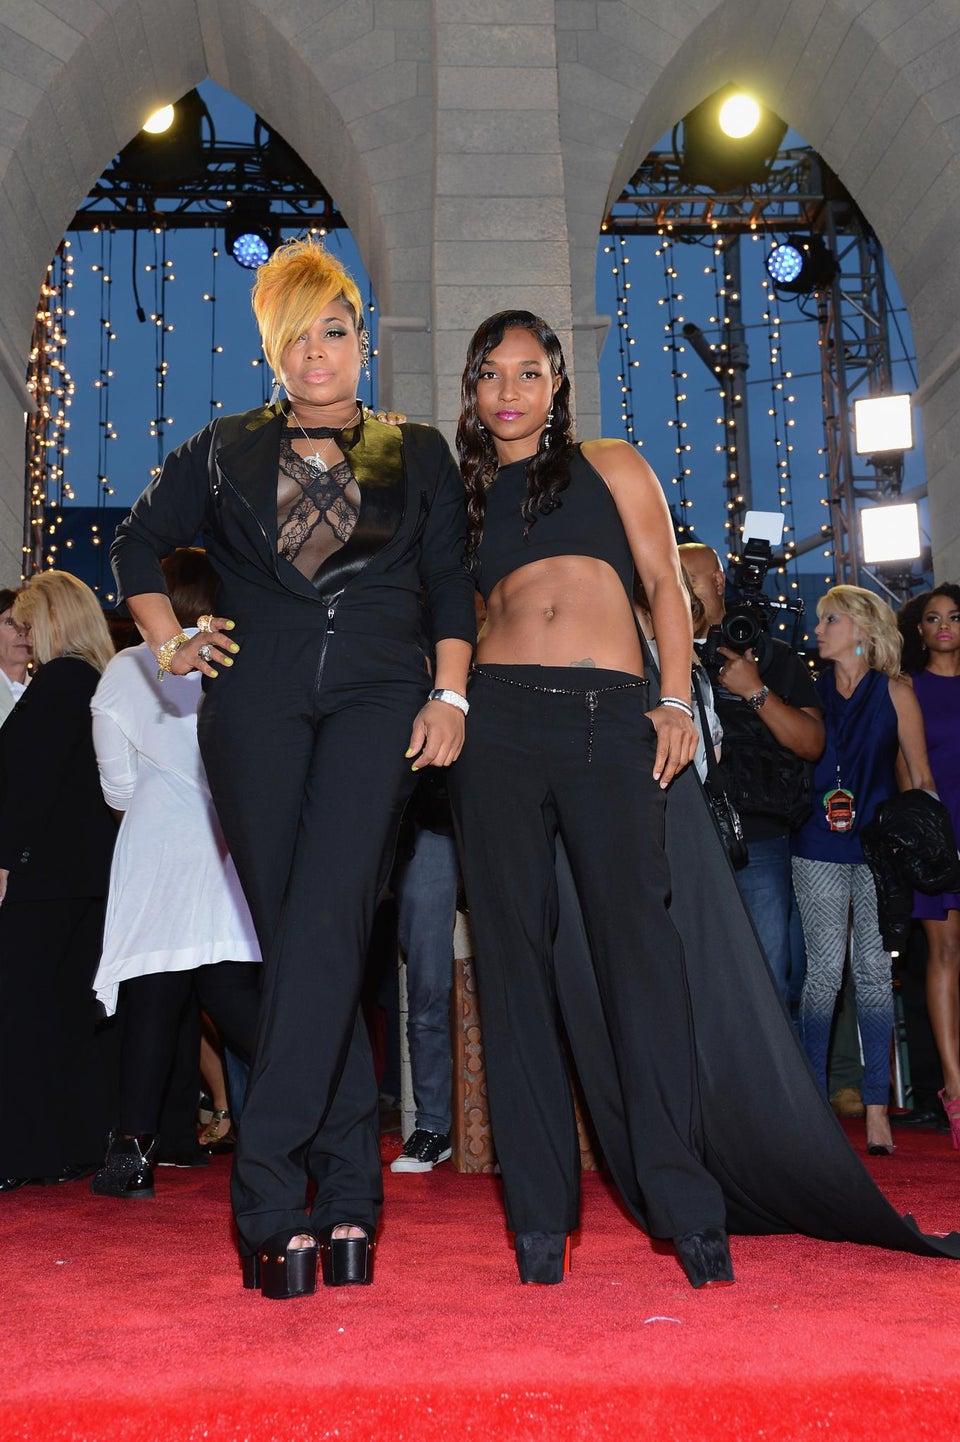 TLC to Collaborate With Ne-Yo, Lady Gaga on New Album